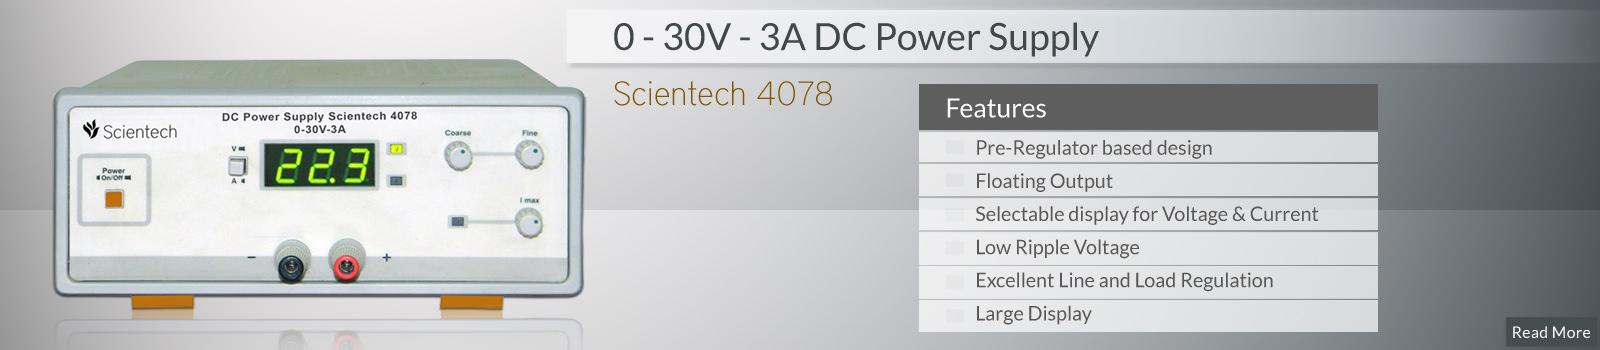 Dc Power Supply Equipment Manufacturer in India - Scientech